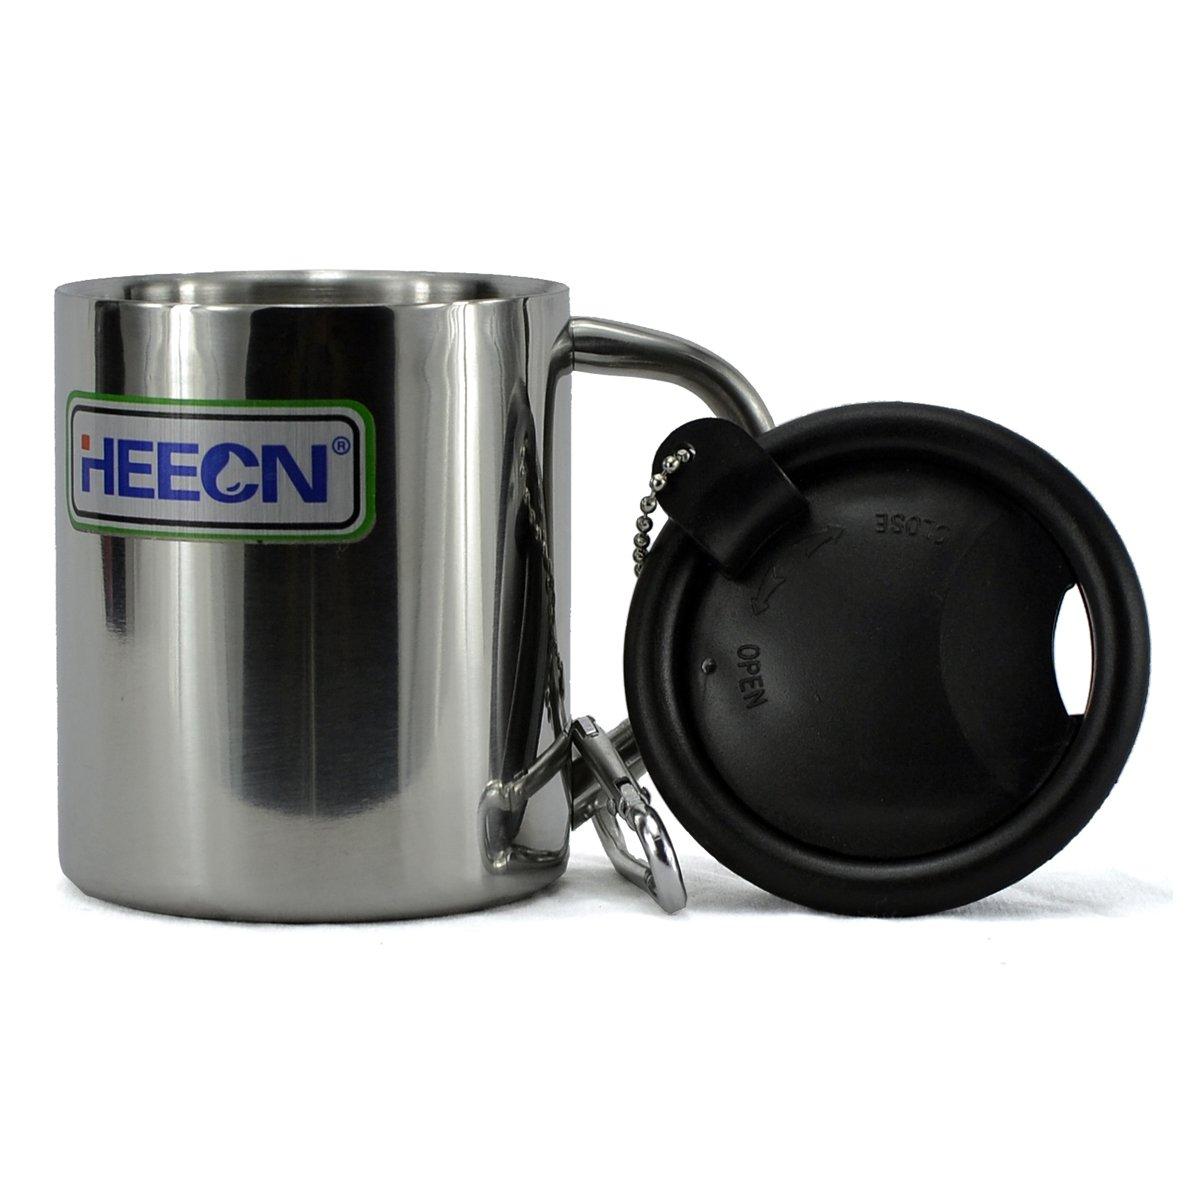 heecn Camping Becher 220ml mit Deckel doppelwandig Edelstahl Kaffee Tasse Ltd.